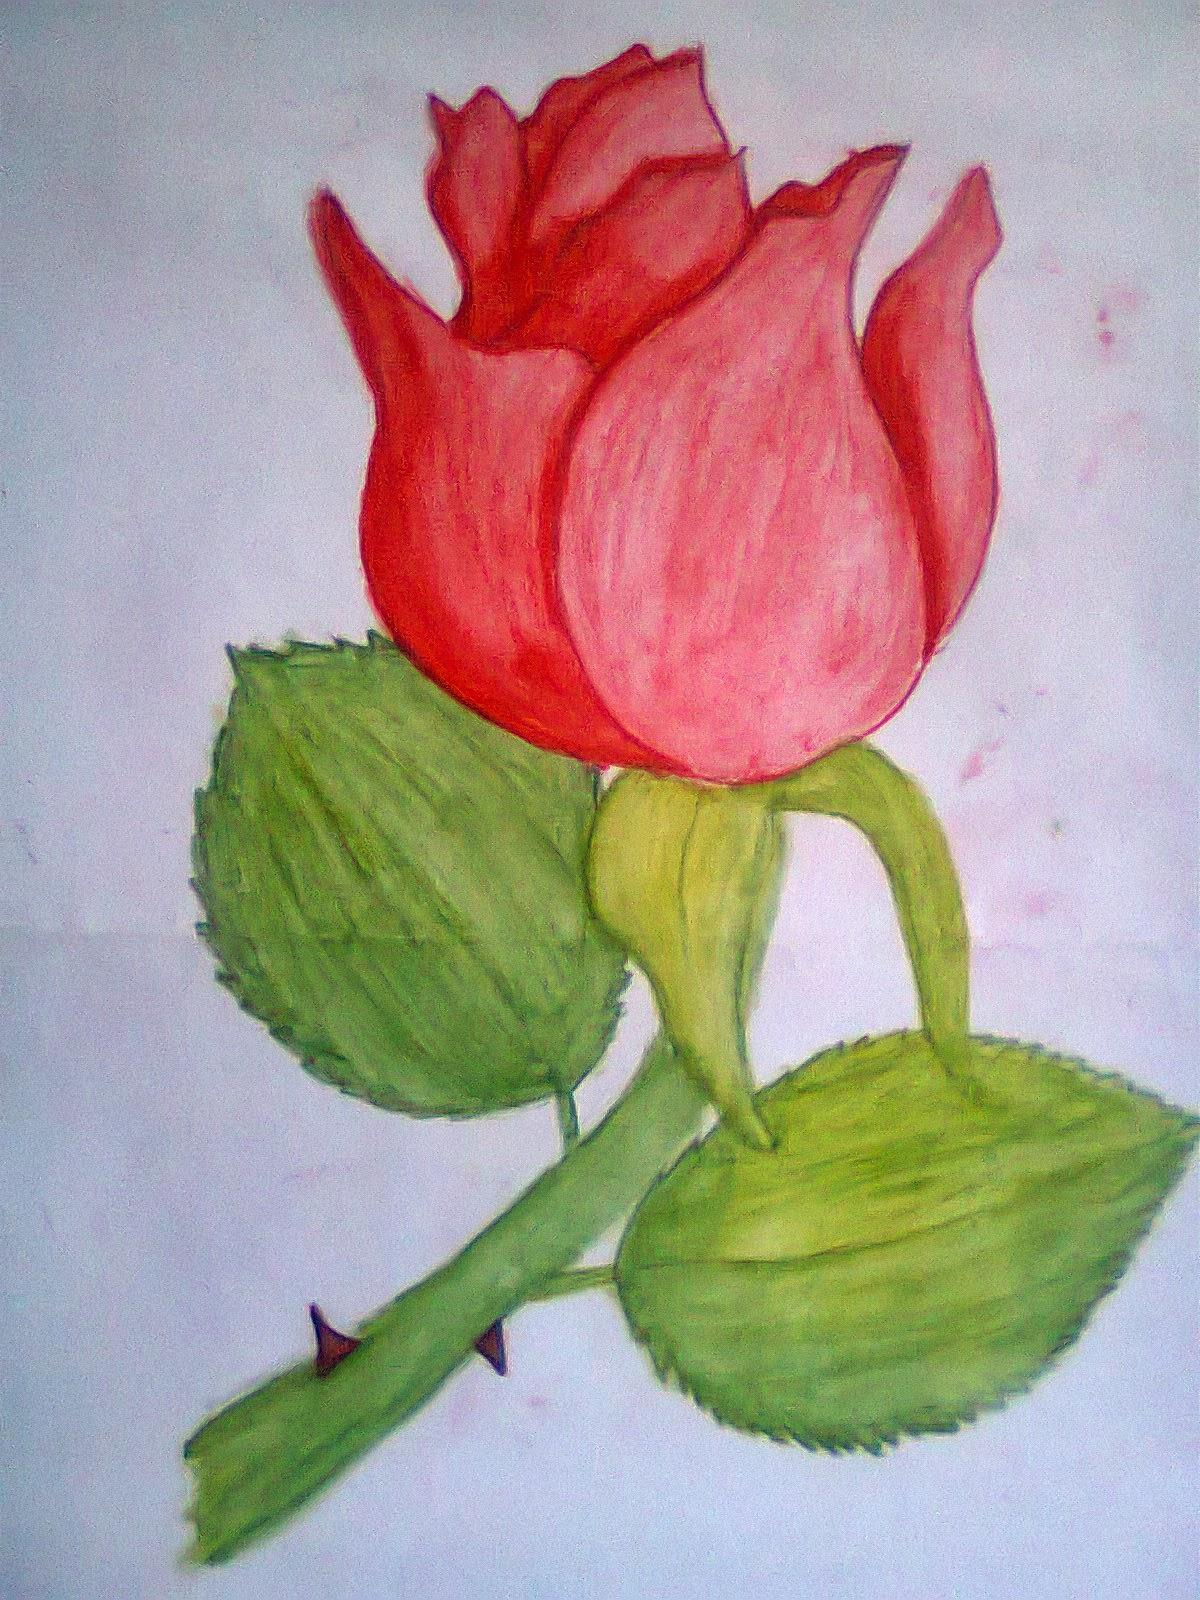 Gambar Lukisan Mudah : gambar, lukisan, mudah, Lukisan, Mudah, Dilukis, Cikimm.com